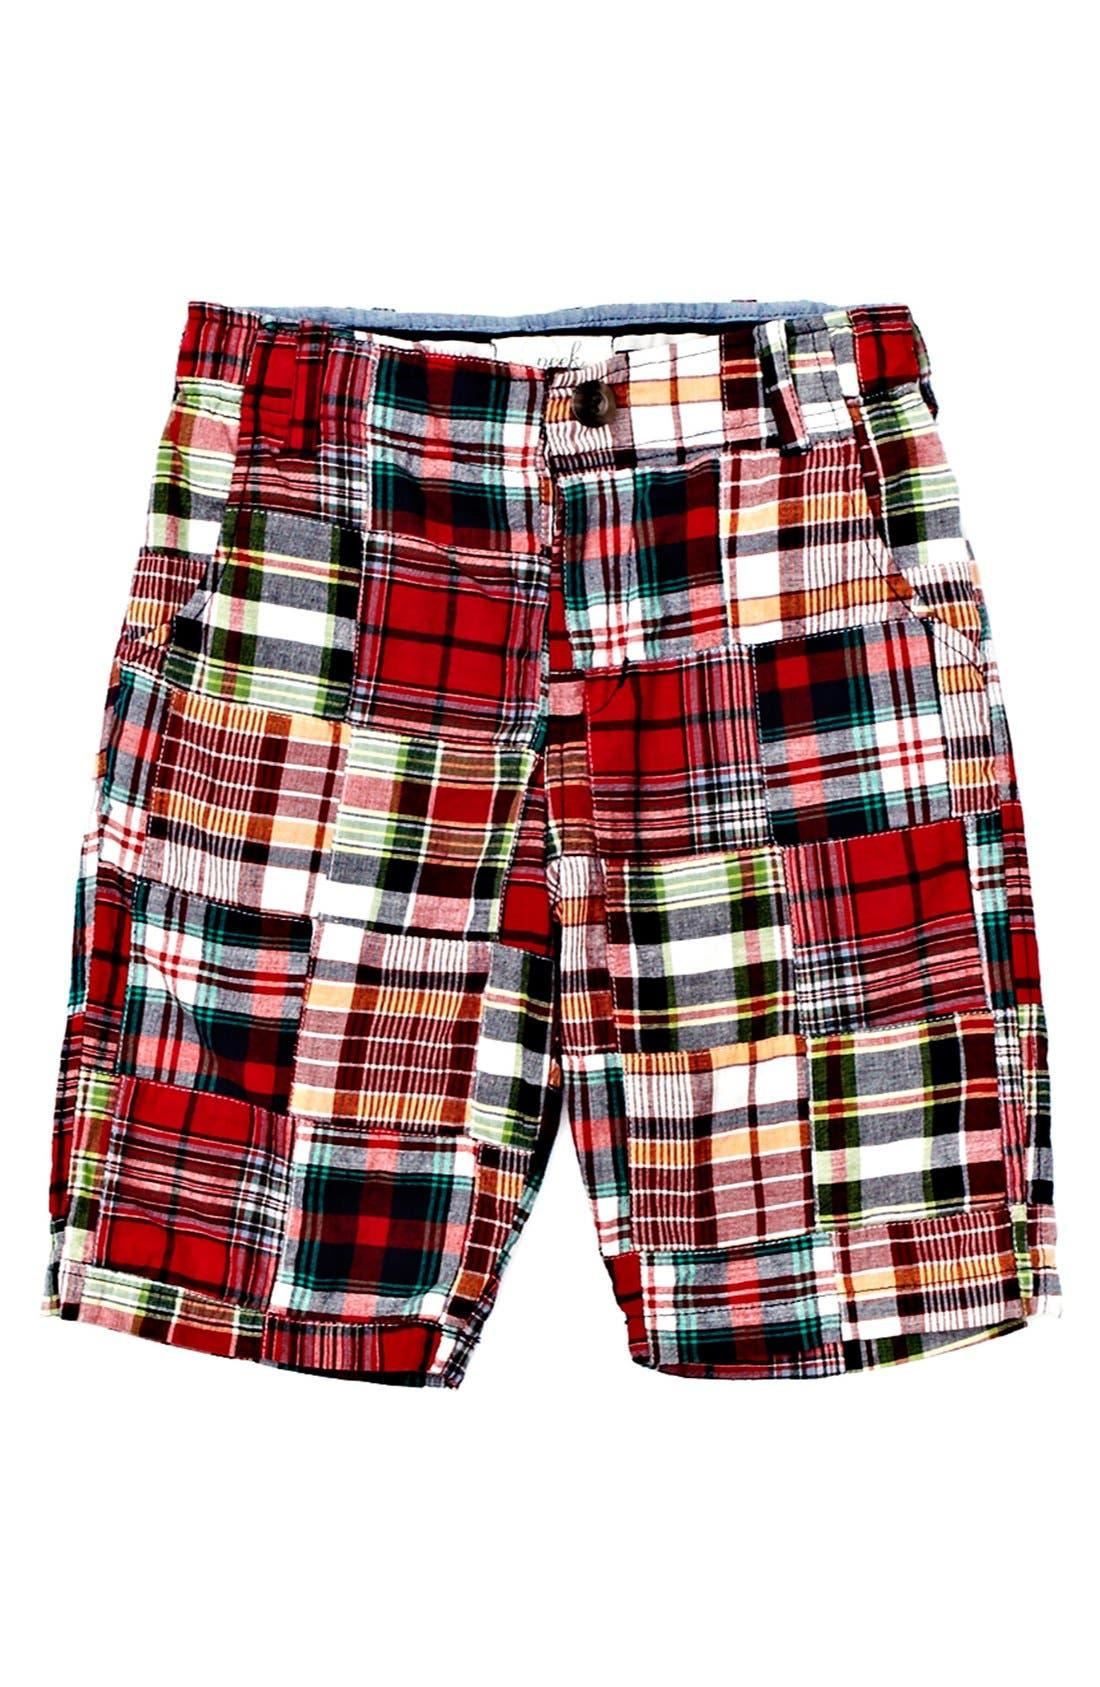 Alternate Image 1 Selected - Peek 'Hampton Patch' Plaid Shorts (Toddler Boys, Little Boys & Big Boys)